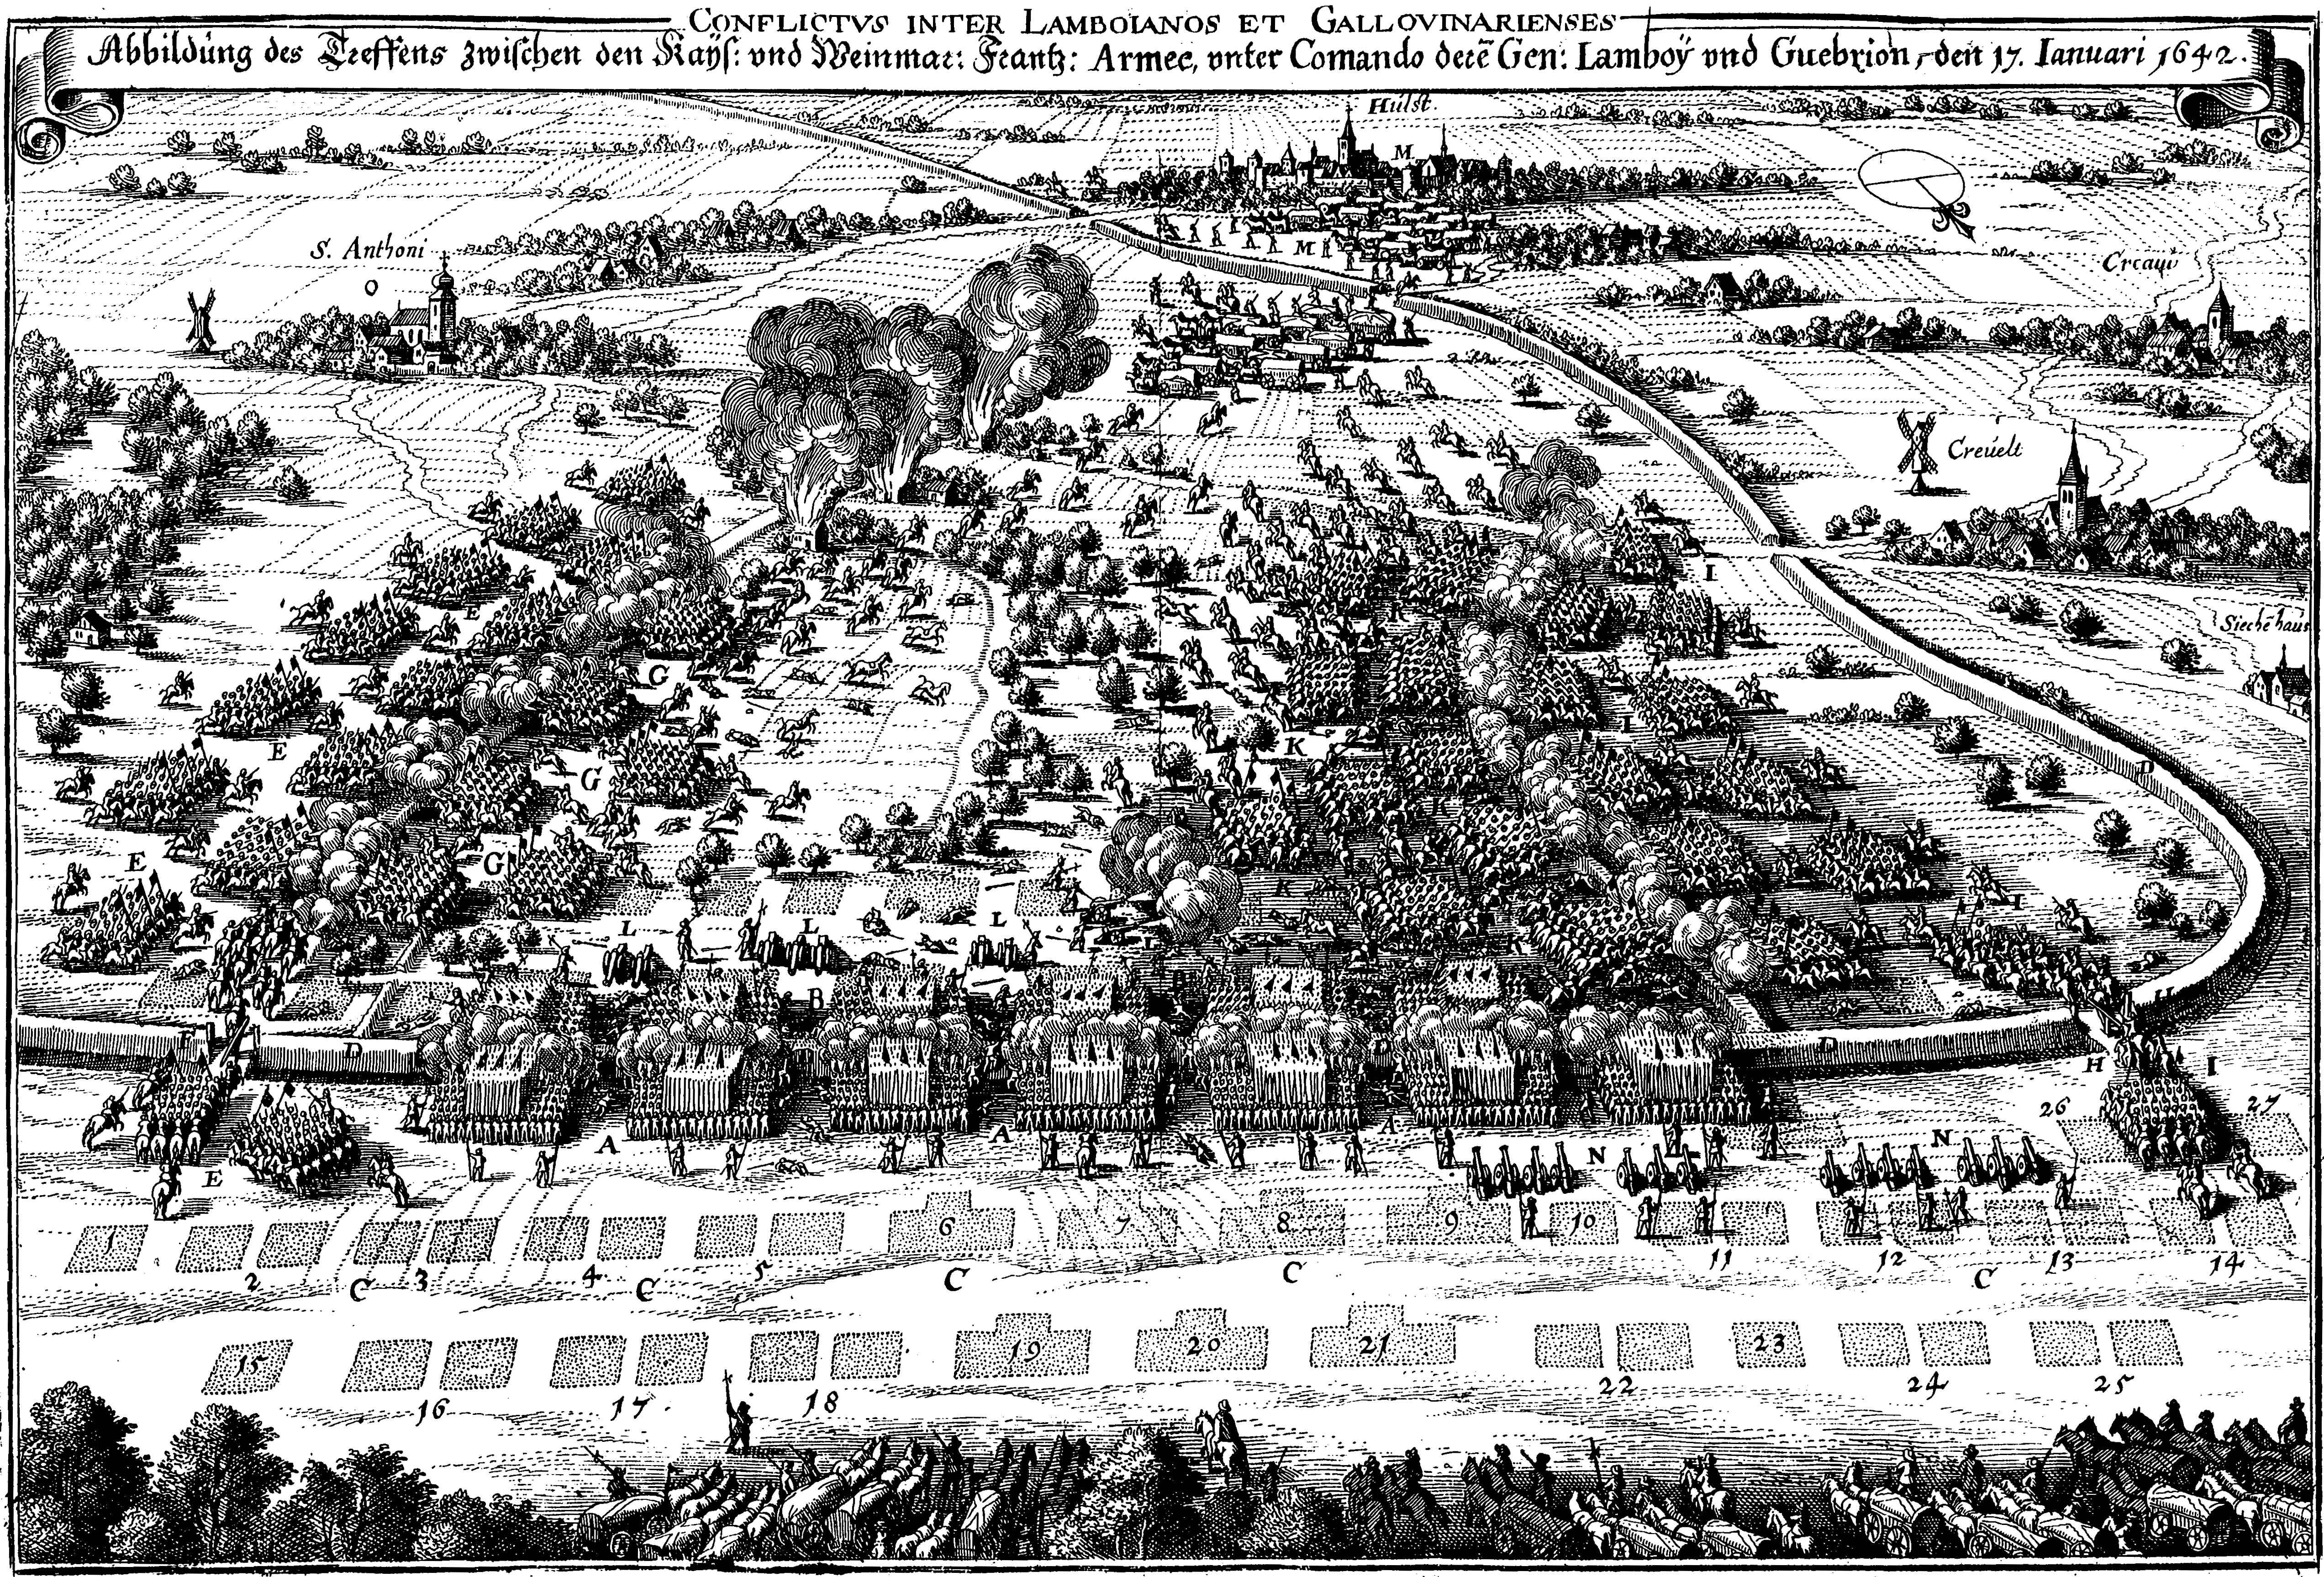 Battle of Kempen